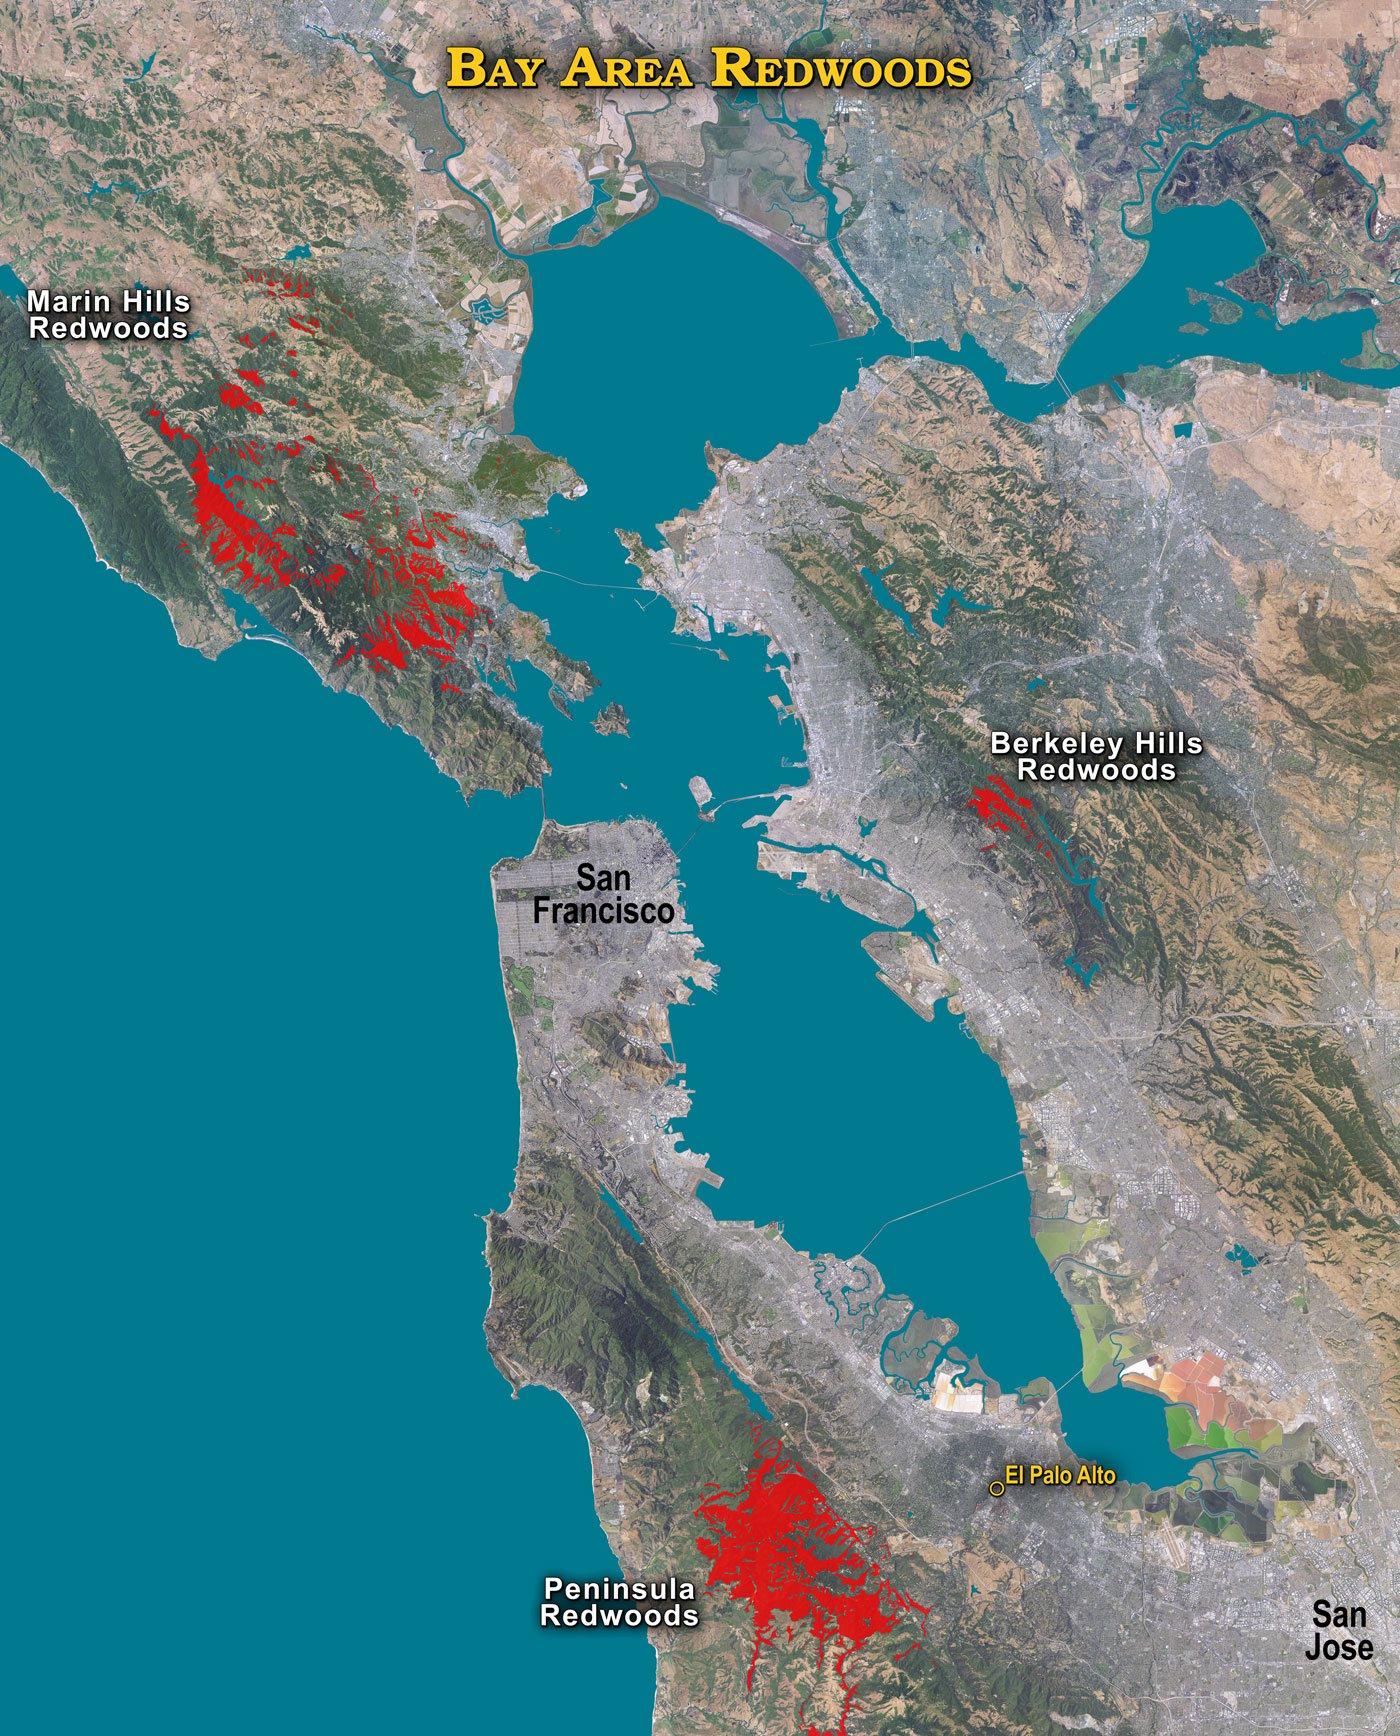 Map of San Francisco Bay Area coast redwoods